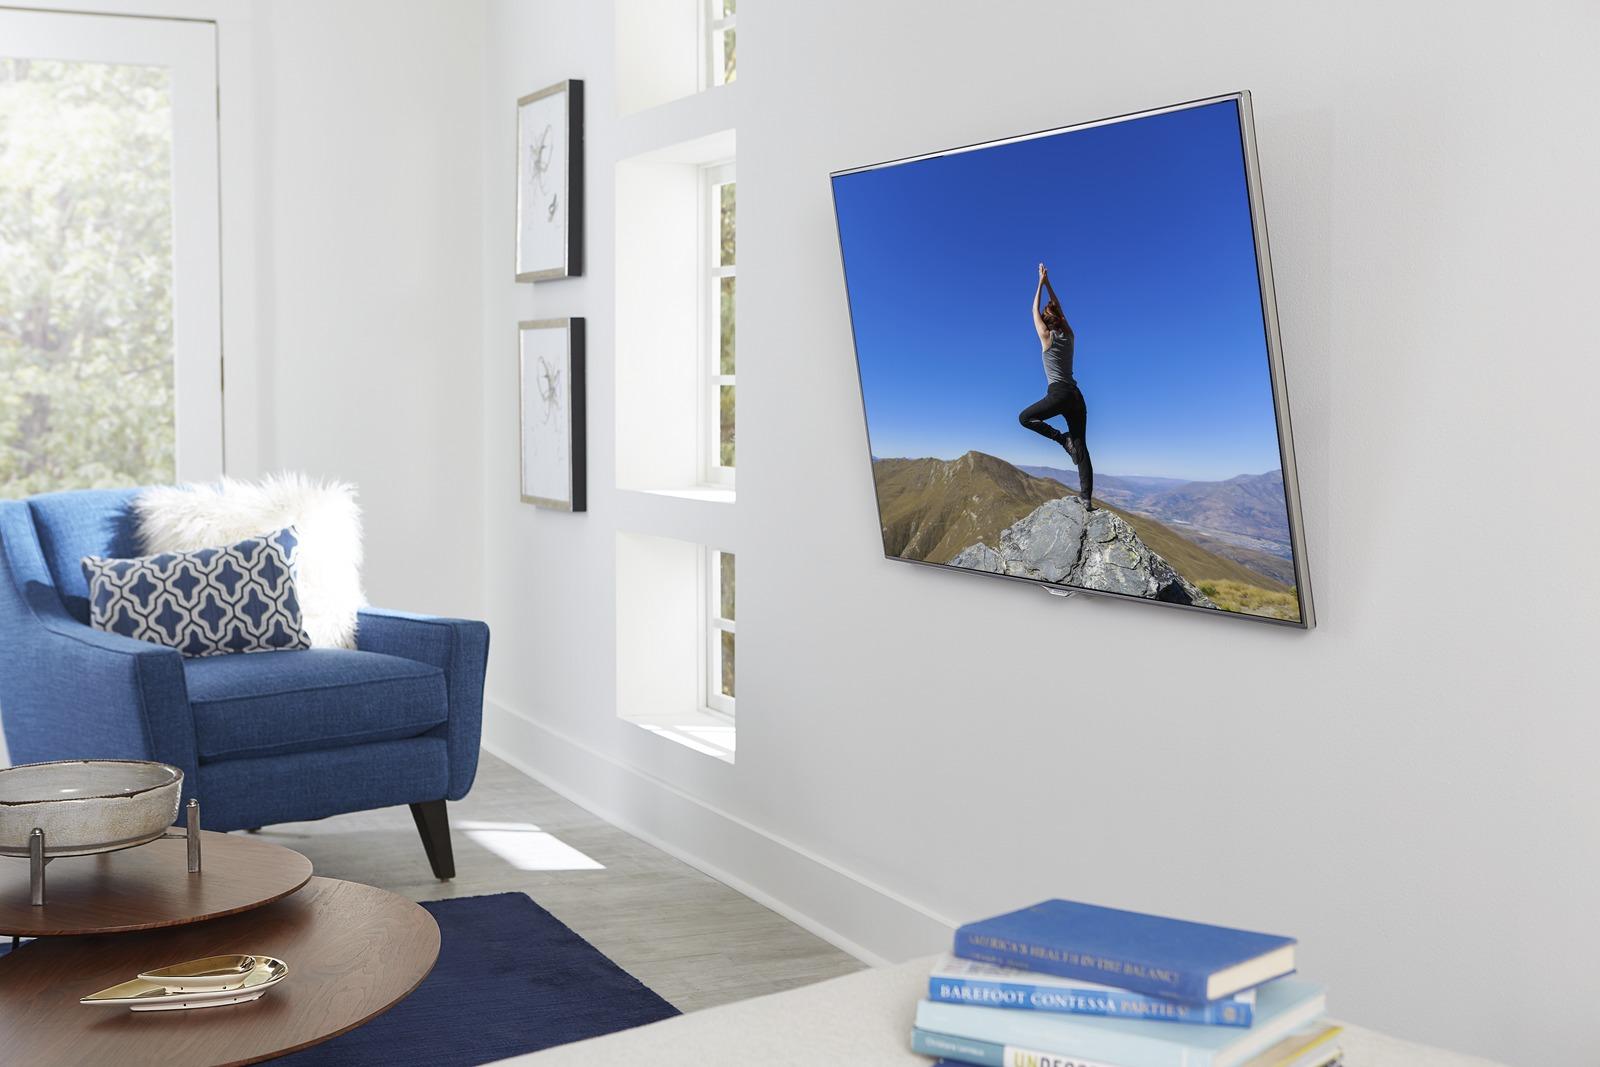 tilting TV mount tilting down